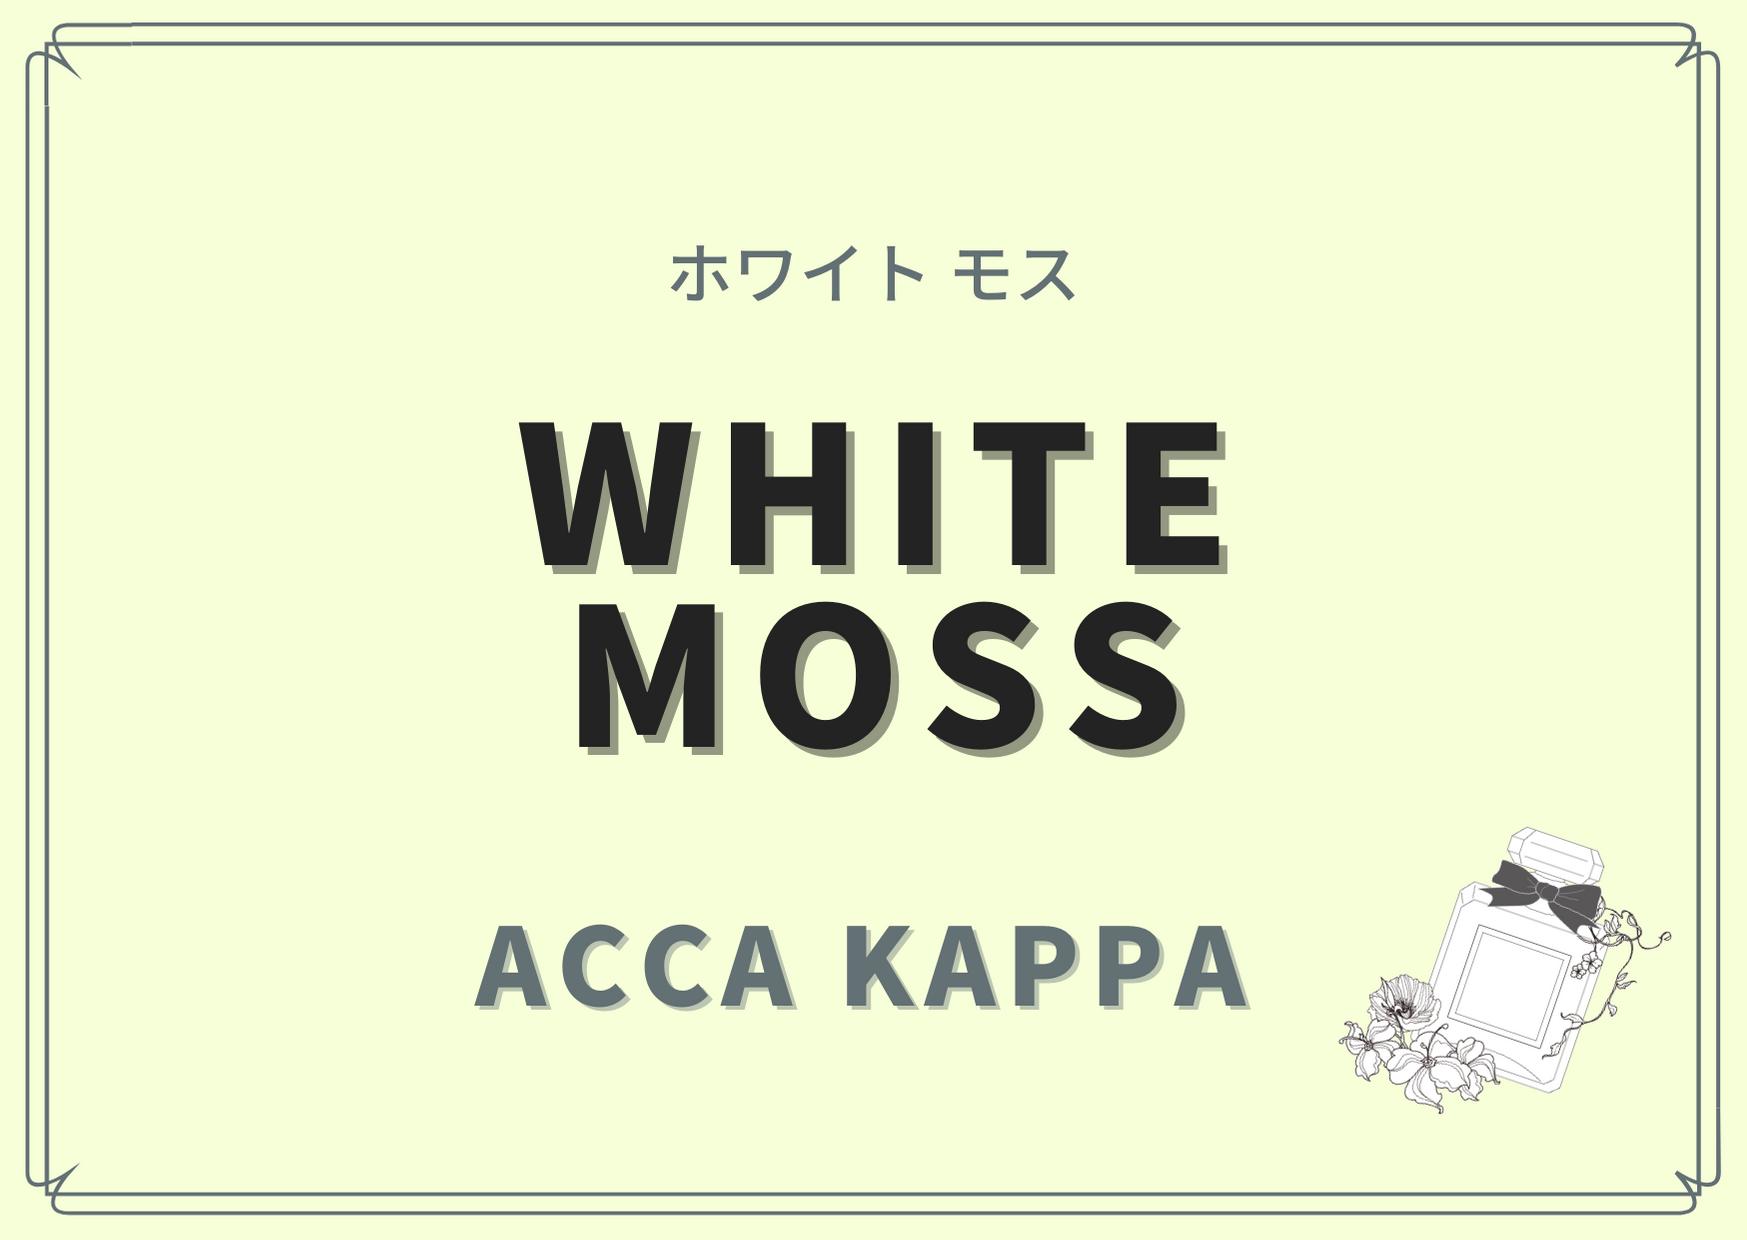 White Moss(ホワイト モス)/ACCA KAPPA (アッカ パッカ)